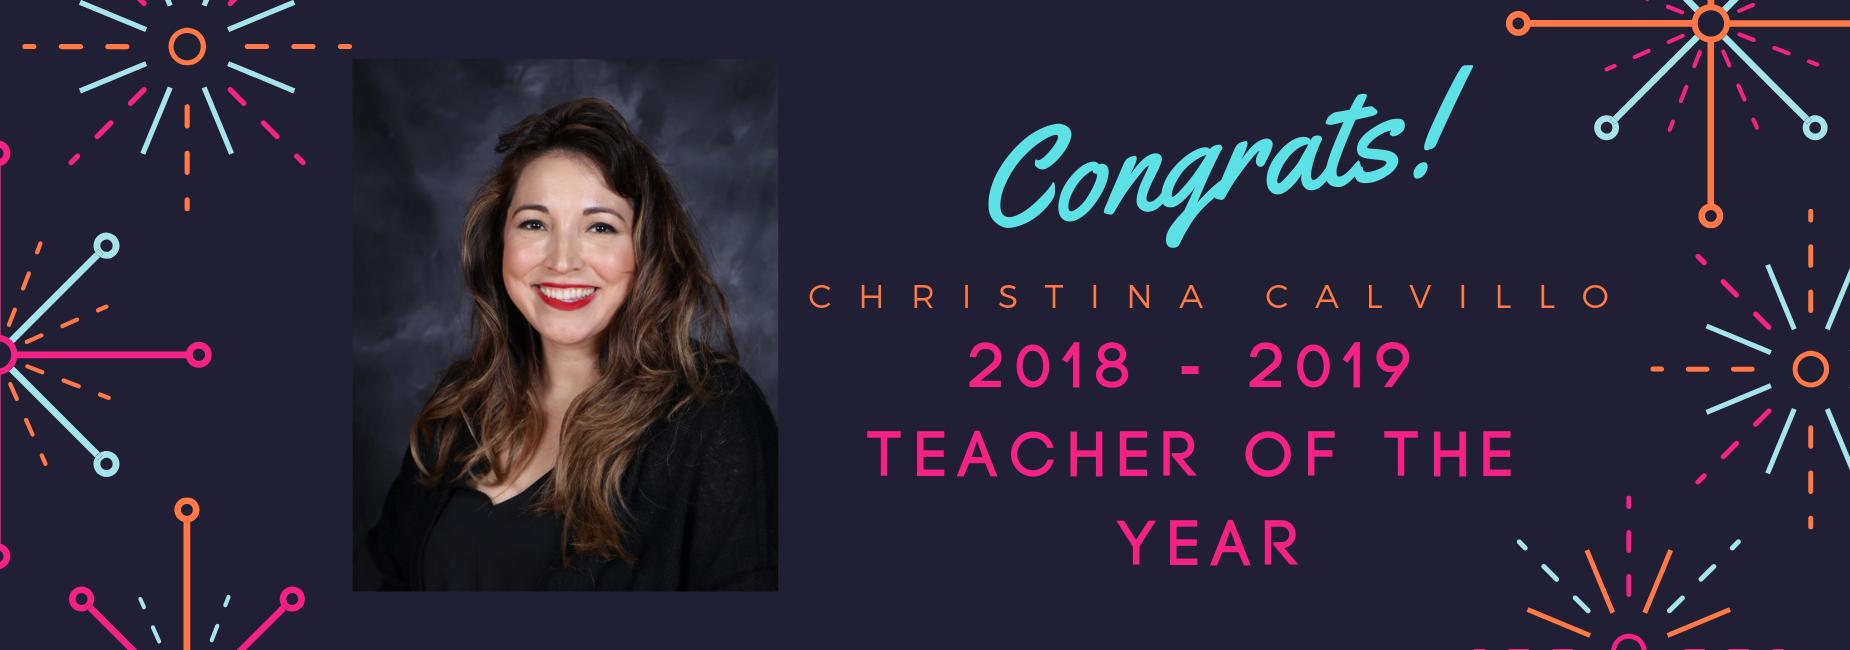 Christina Calvillo Teacher of the year